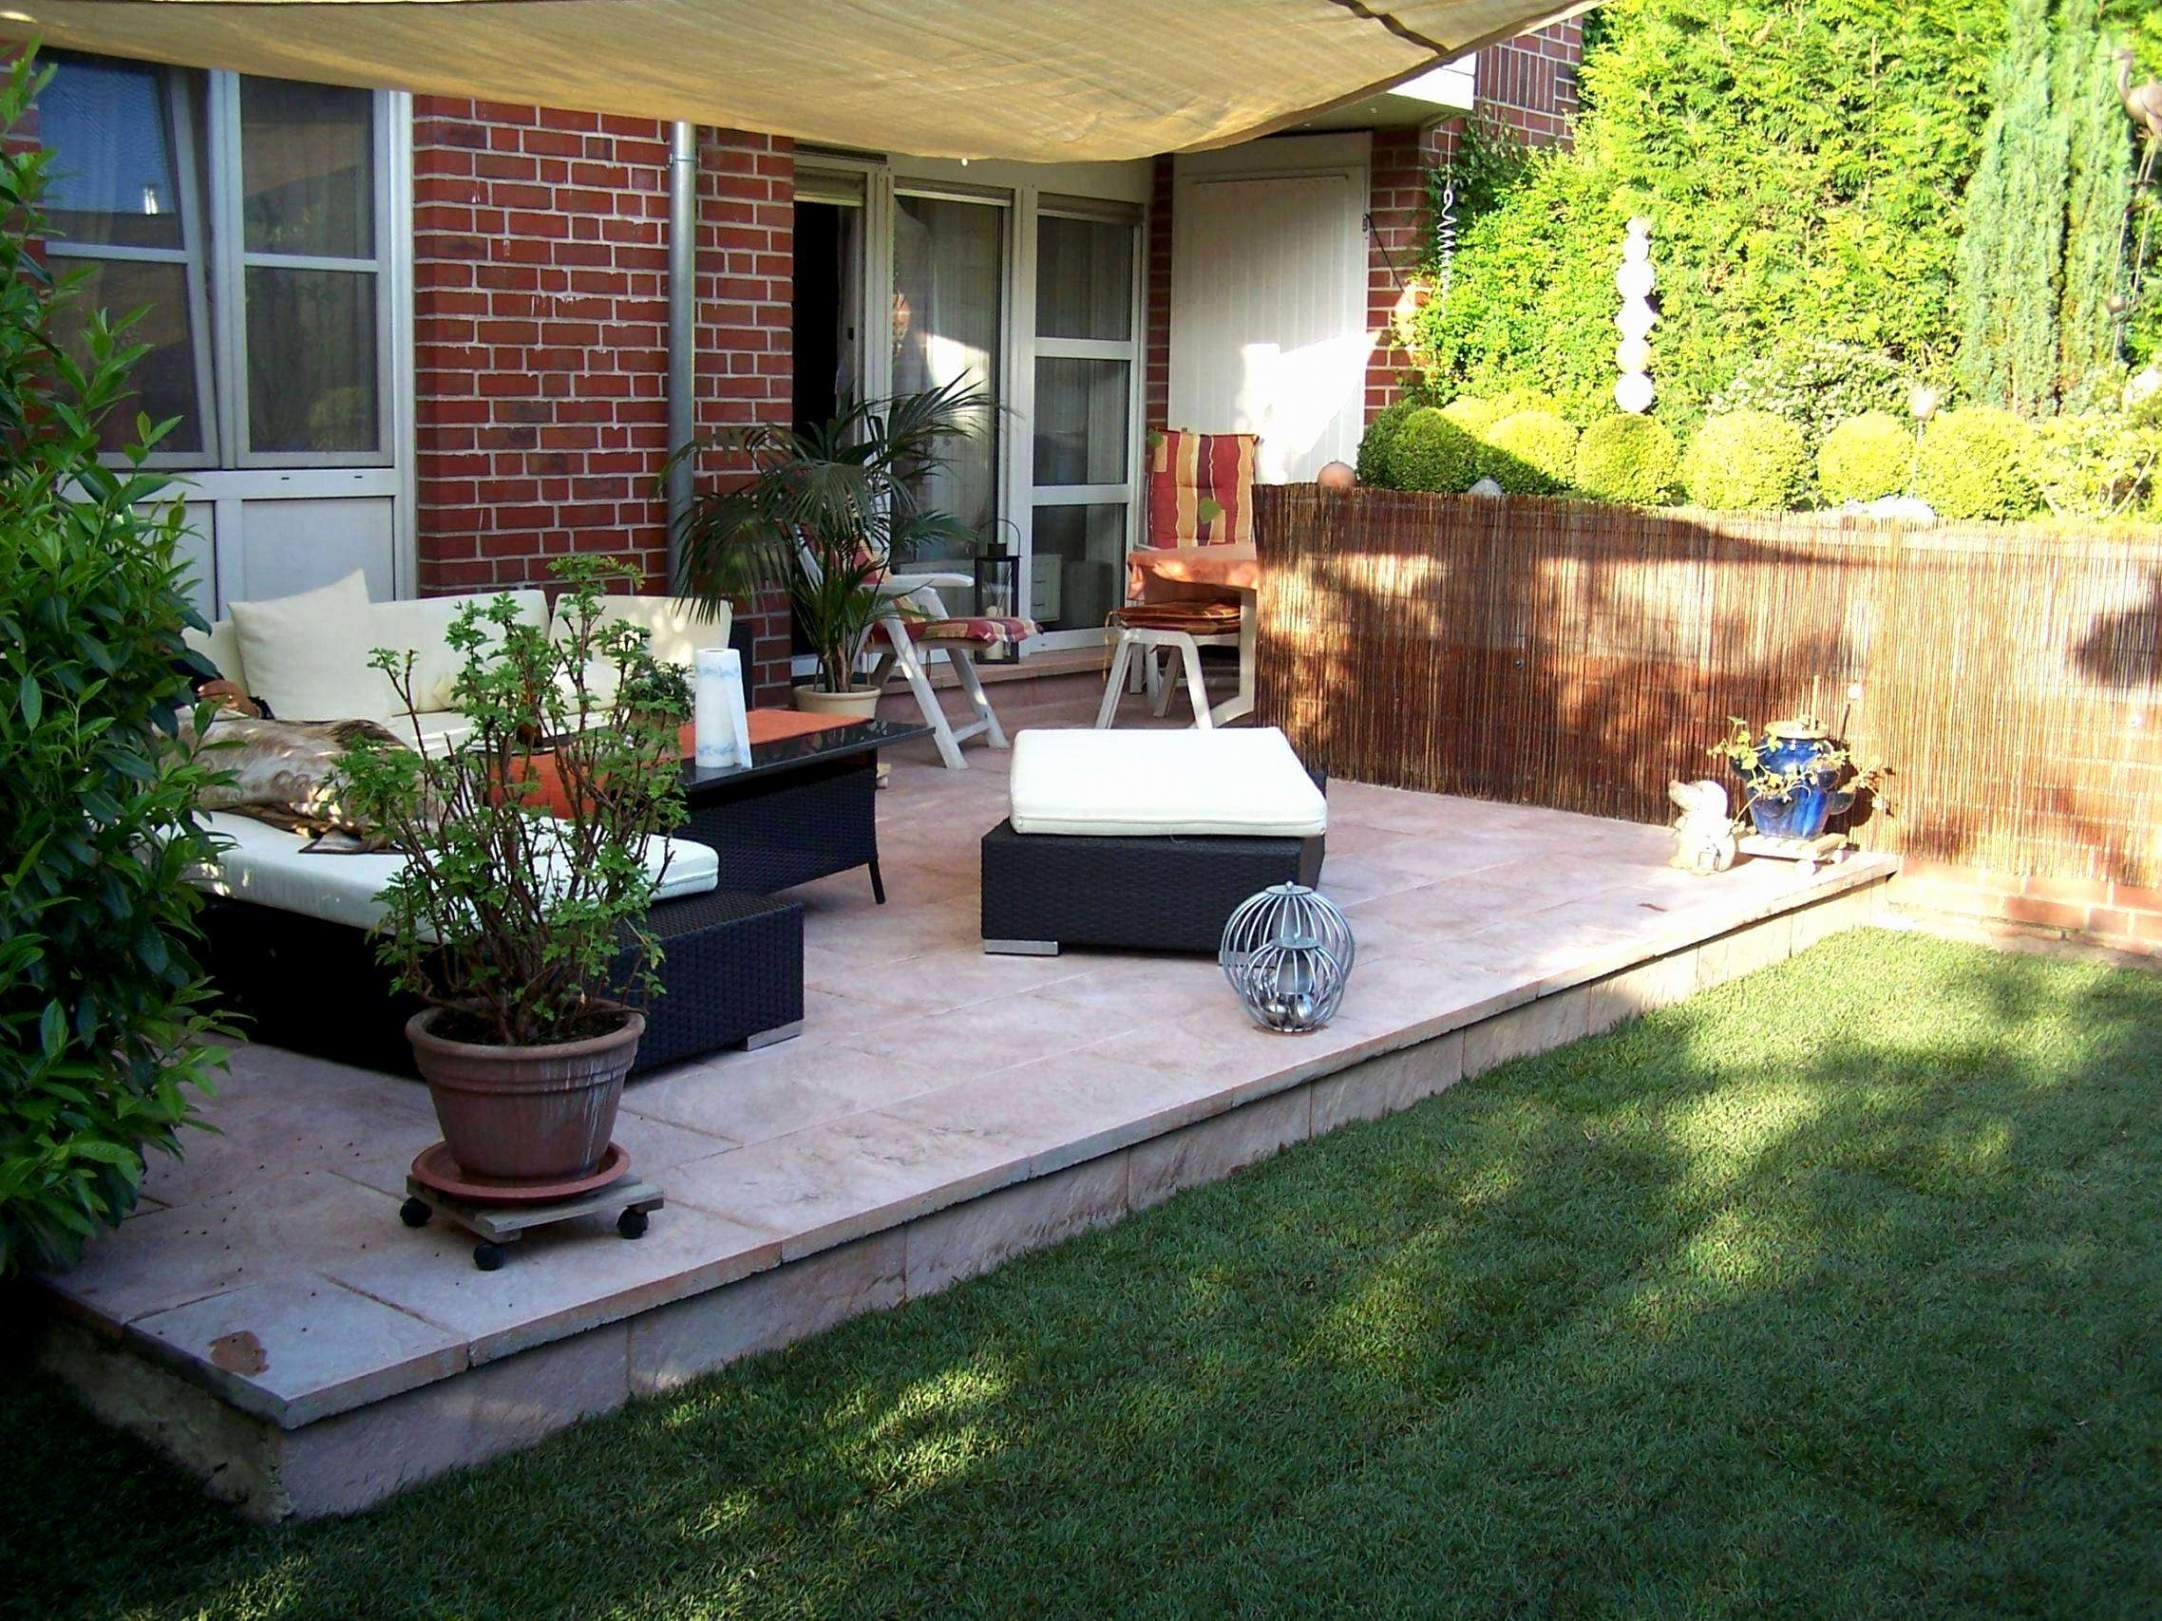 46 kollektion terrassenuberdachung mit lamellen stock mobel aus osb platten mobel aus osb platten 3